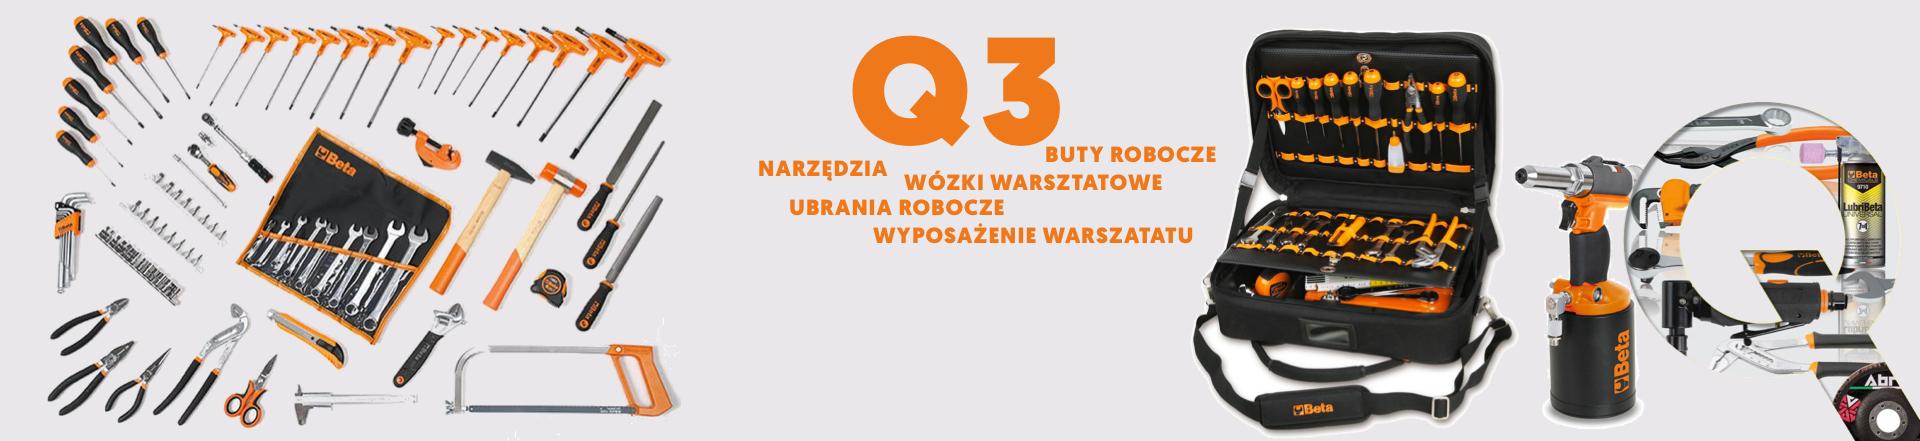 PROMOCJA BETA Q3